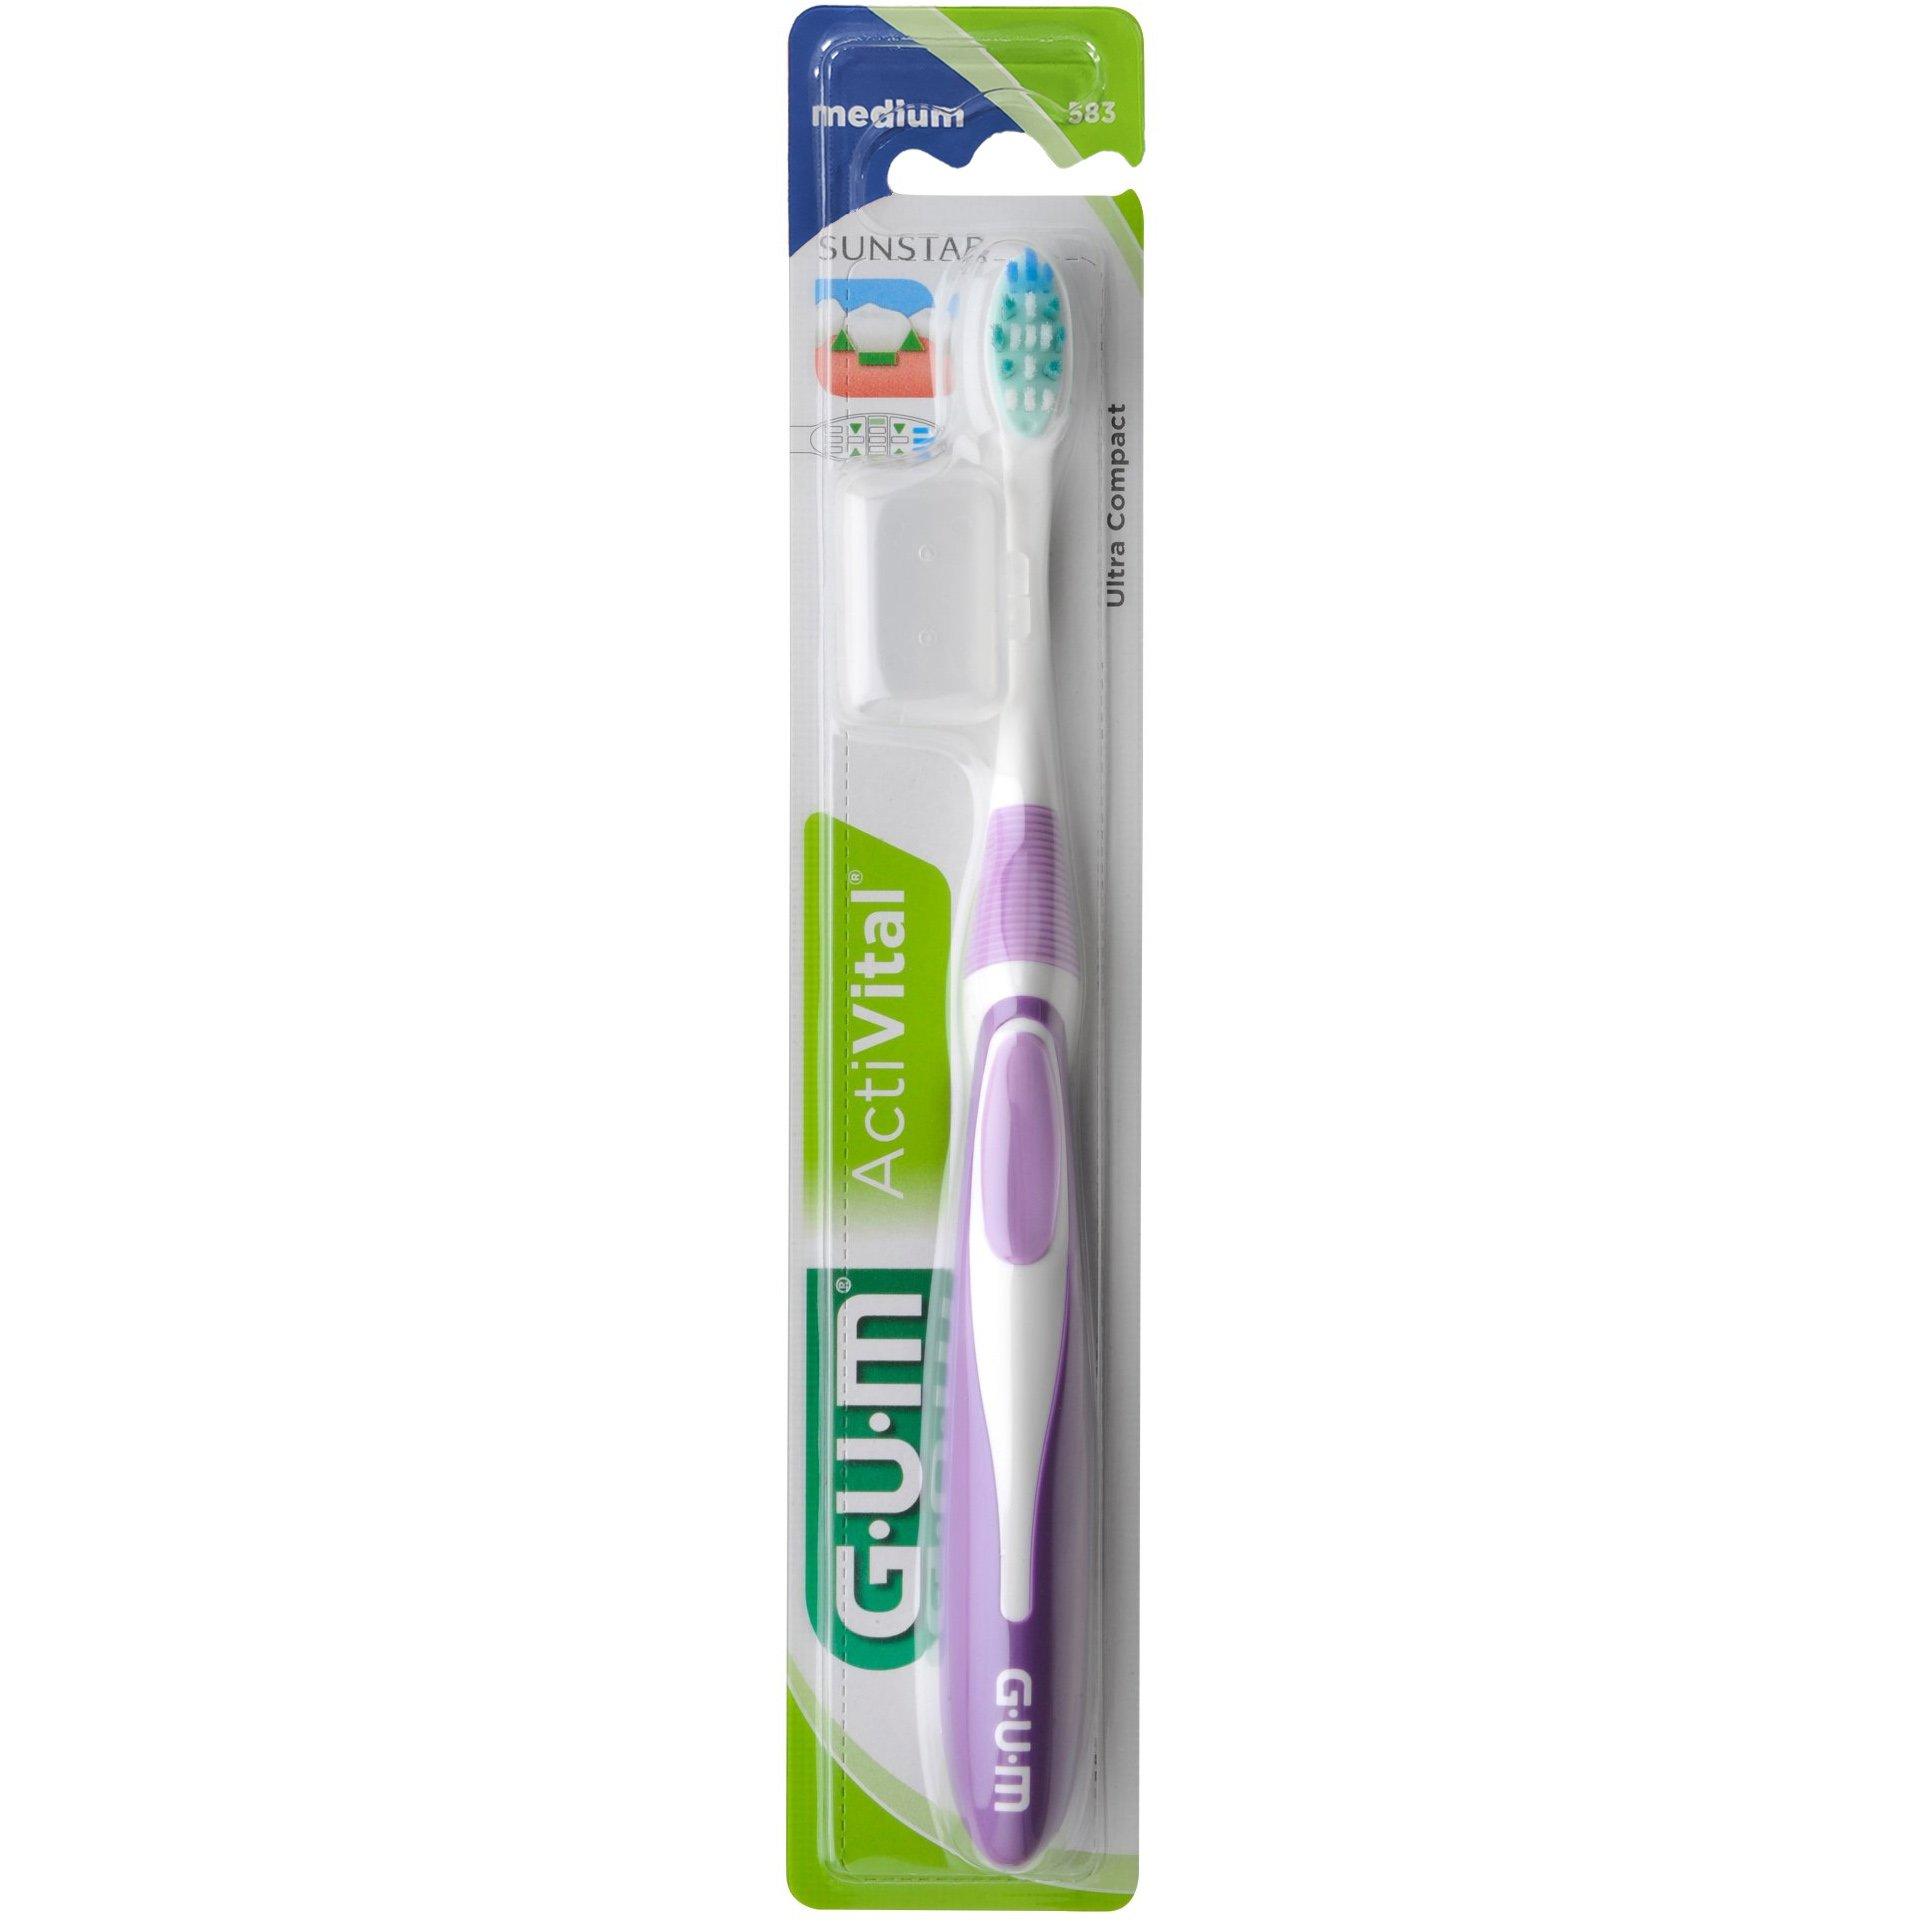 Gum ActiVital Compact Medium (583) Οδοντόβουρτσα Μεσαίας Σκληρότητας με Θήκη Προστασίας 1 Τεμάχιο – μωβ